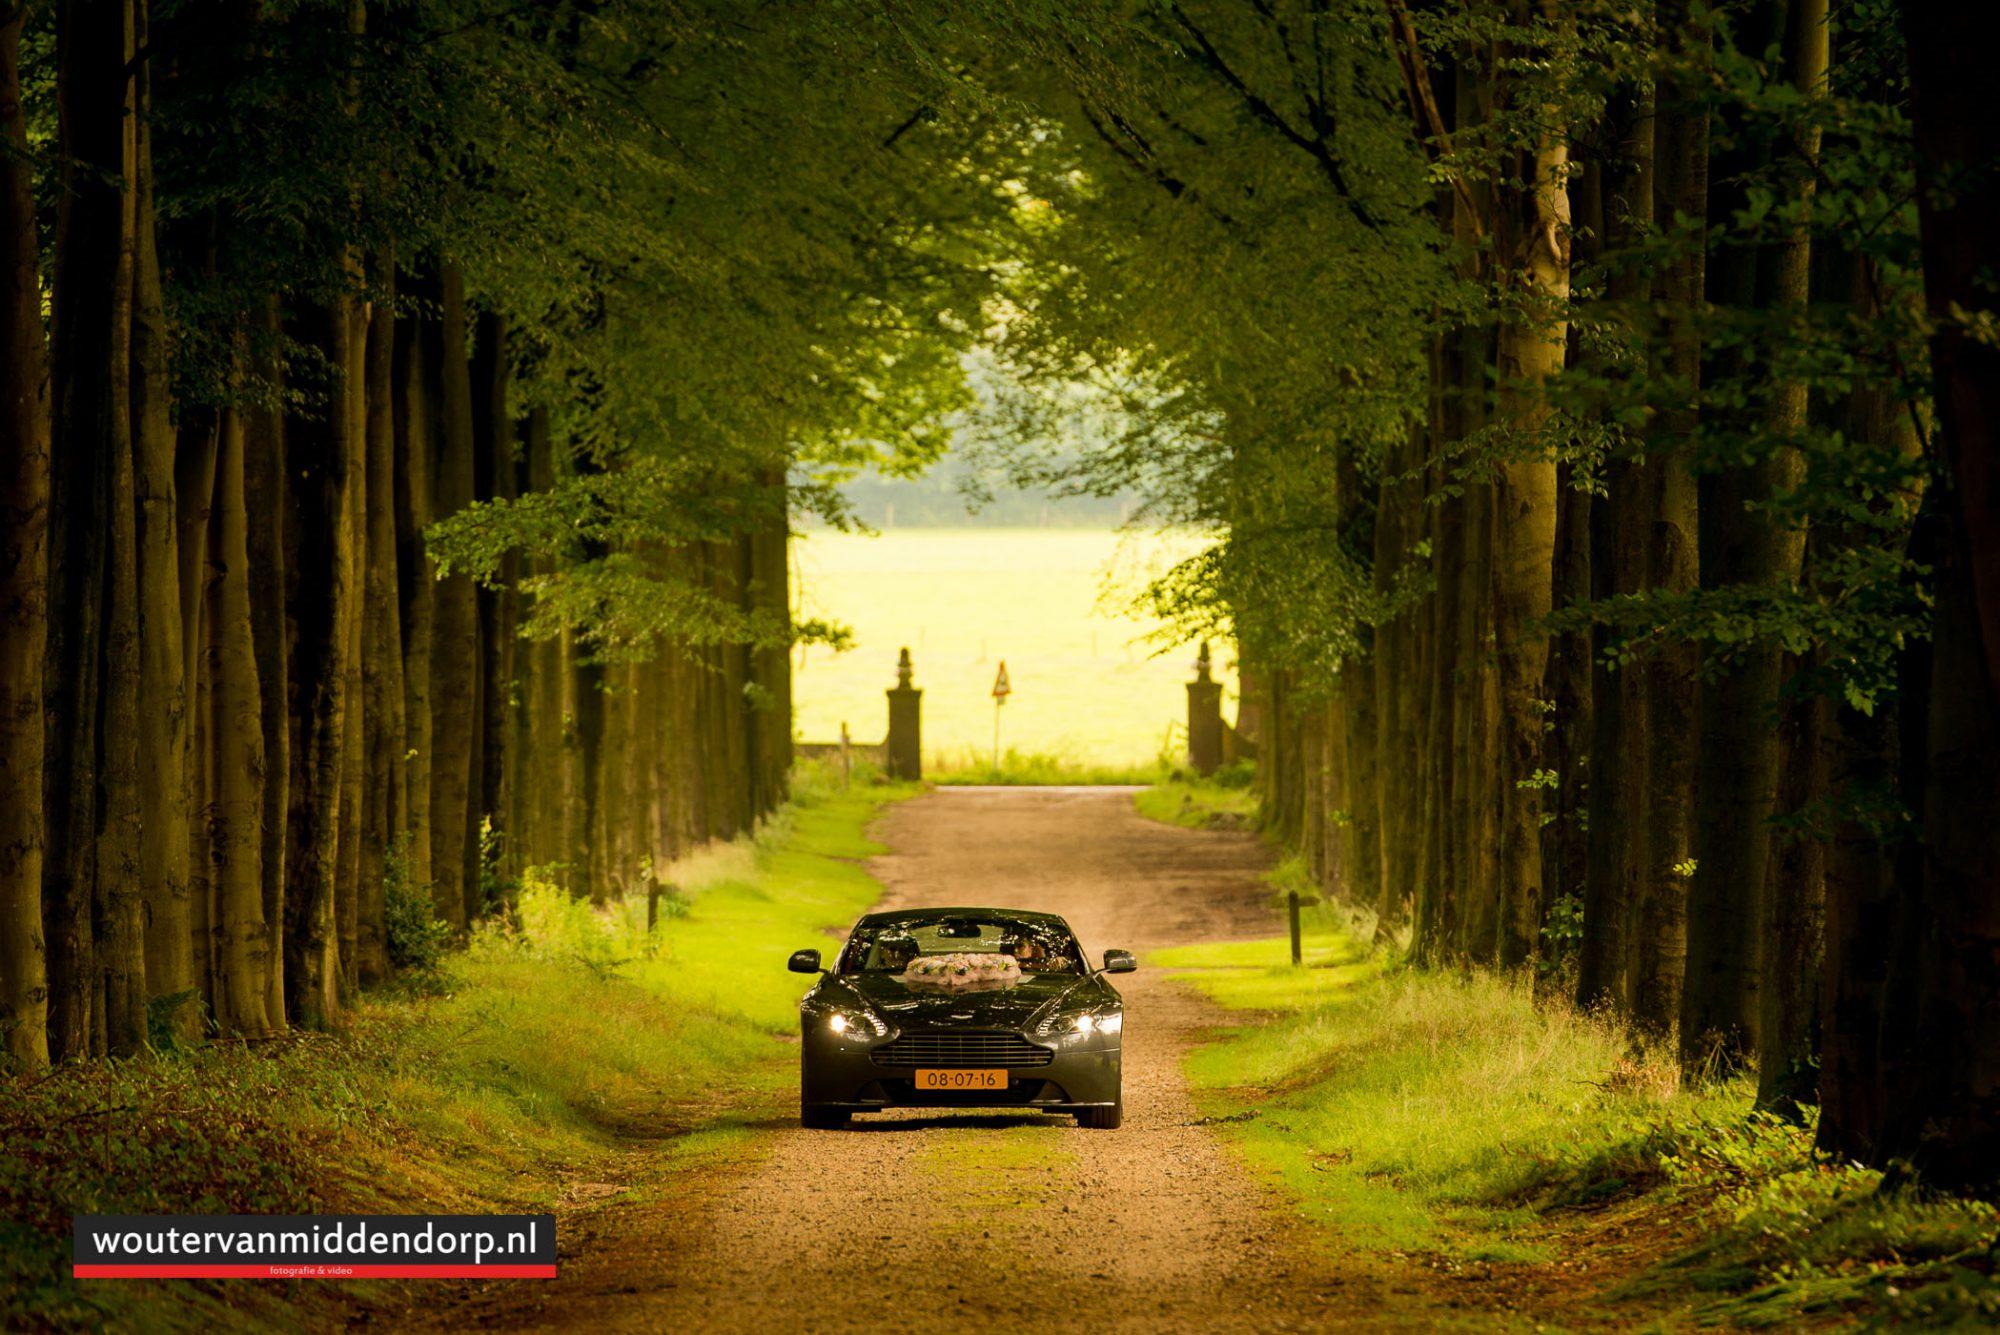 trouwfotograaf-wouter-van-middendorp-omgeving-veluwe-barneveld-uddel-38-van-51